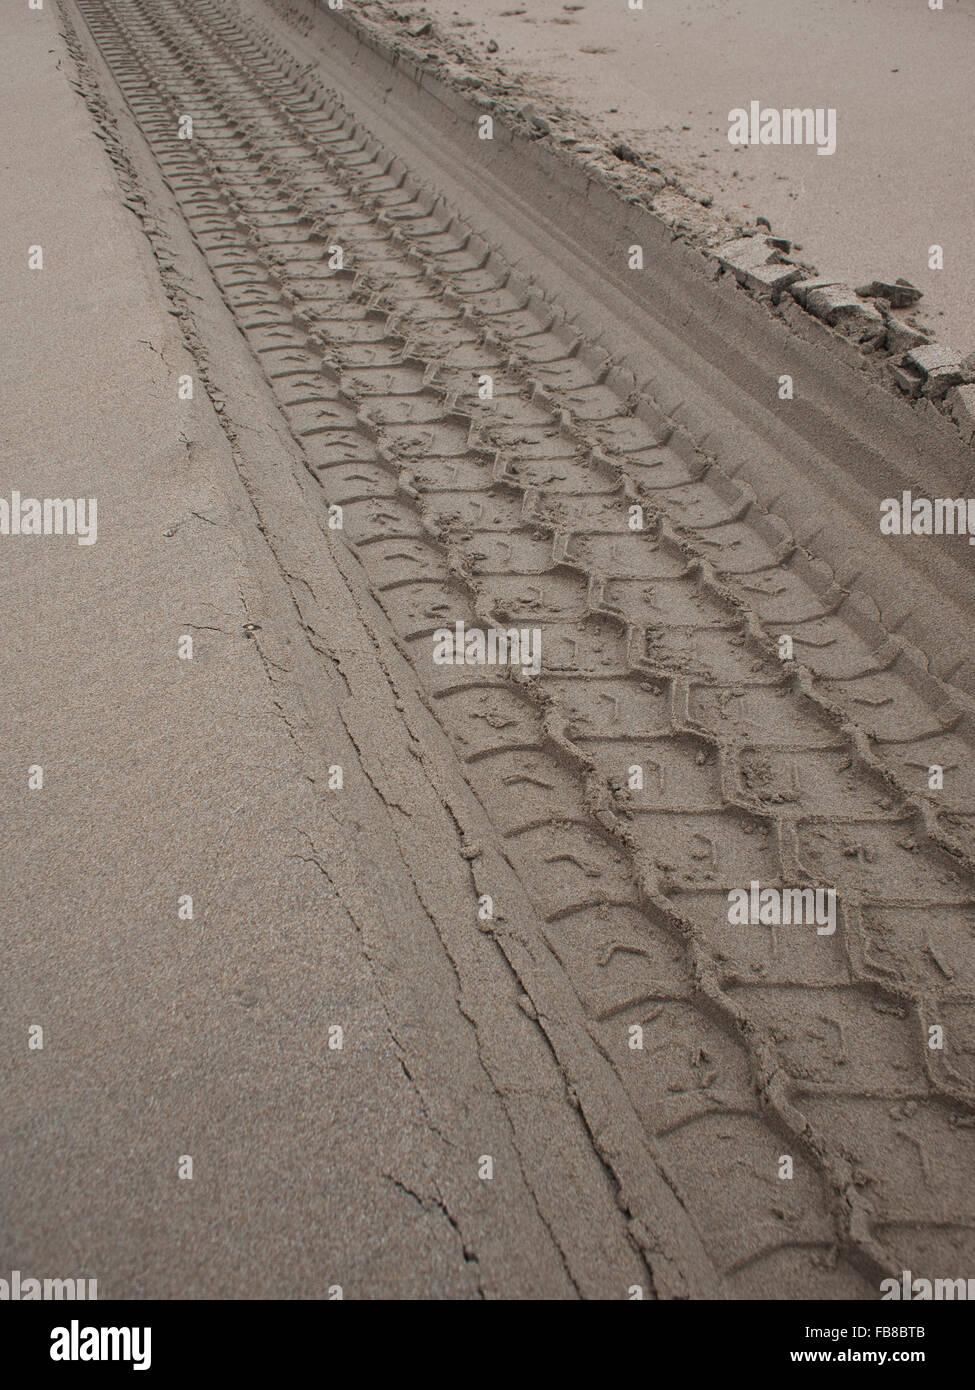 Netherlands, Zandvoort, Tire tracks in sand - Stock Image